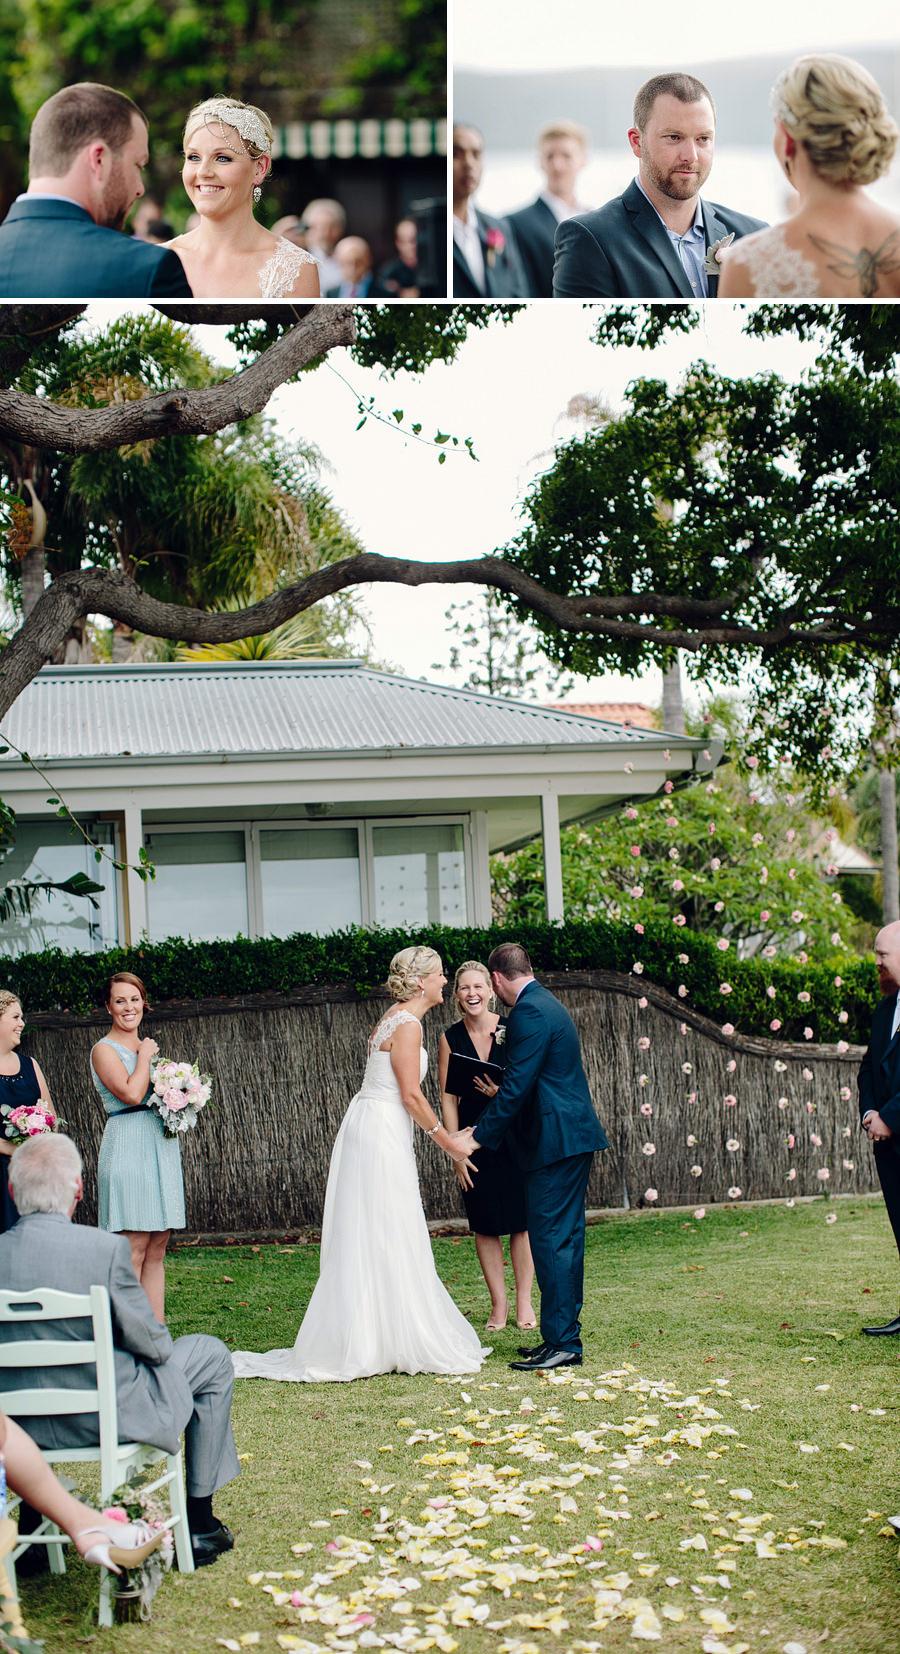 Timeless Wedding Photographers: Ceremony